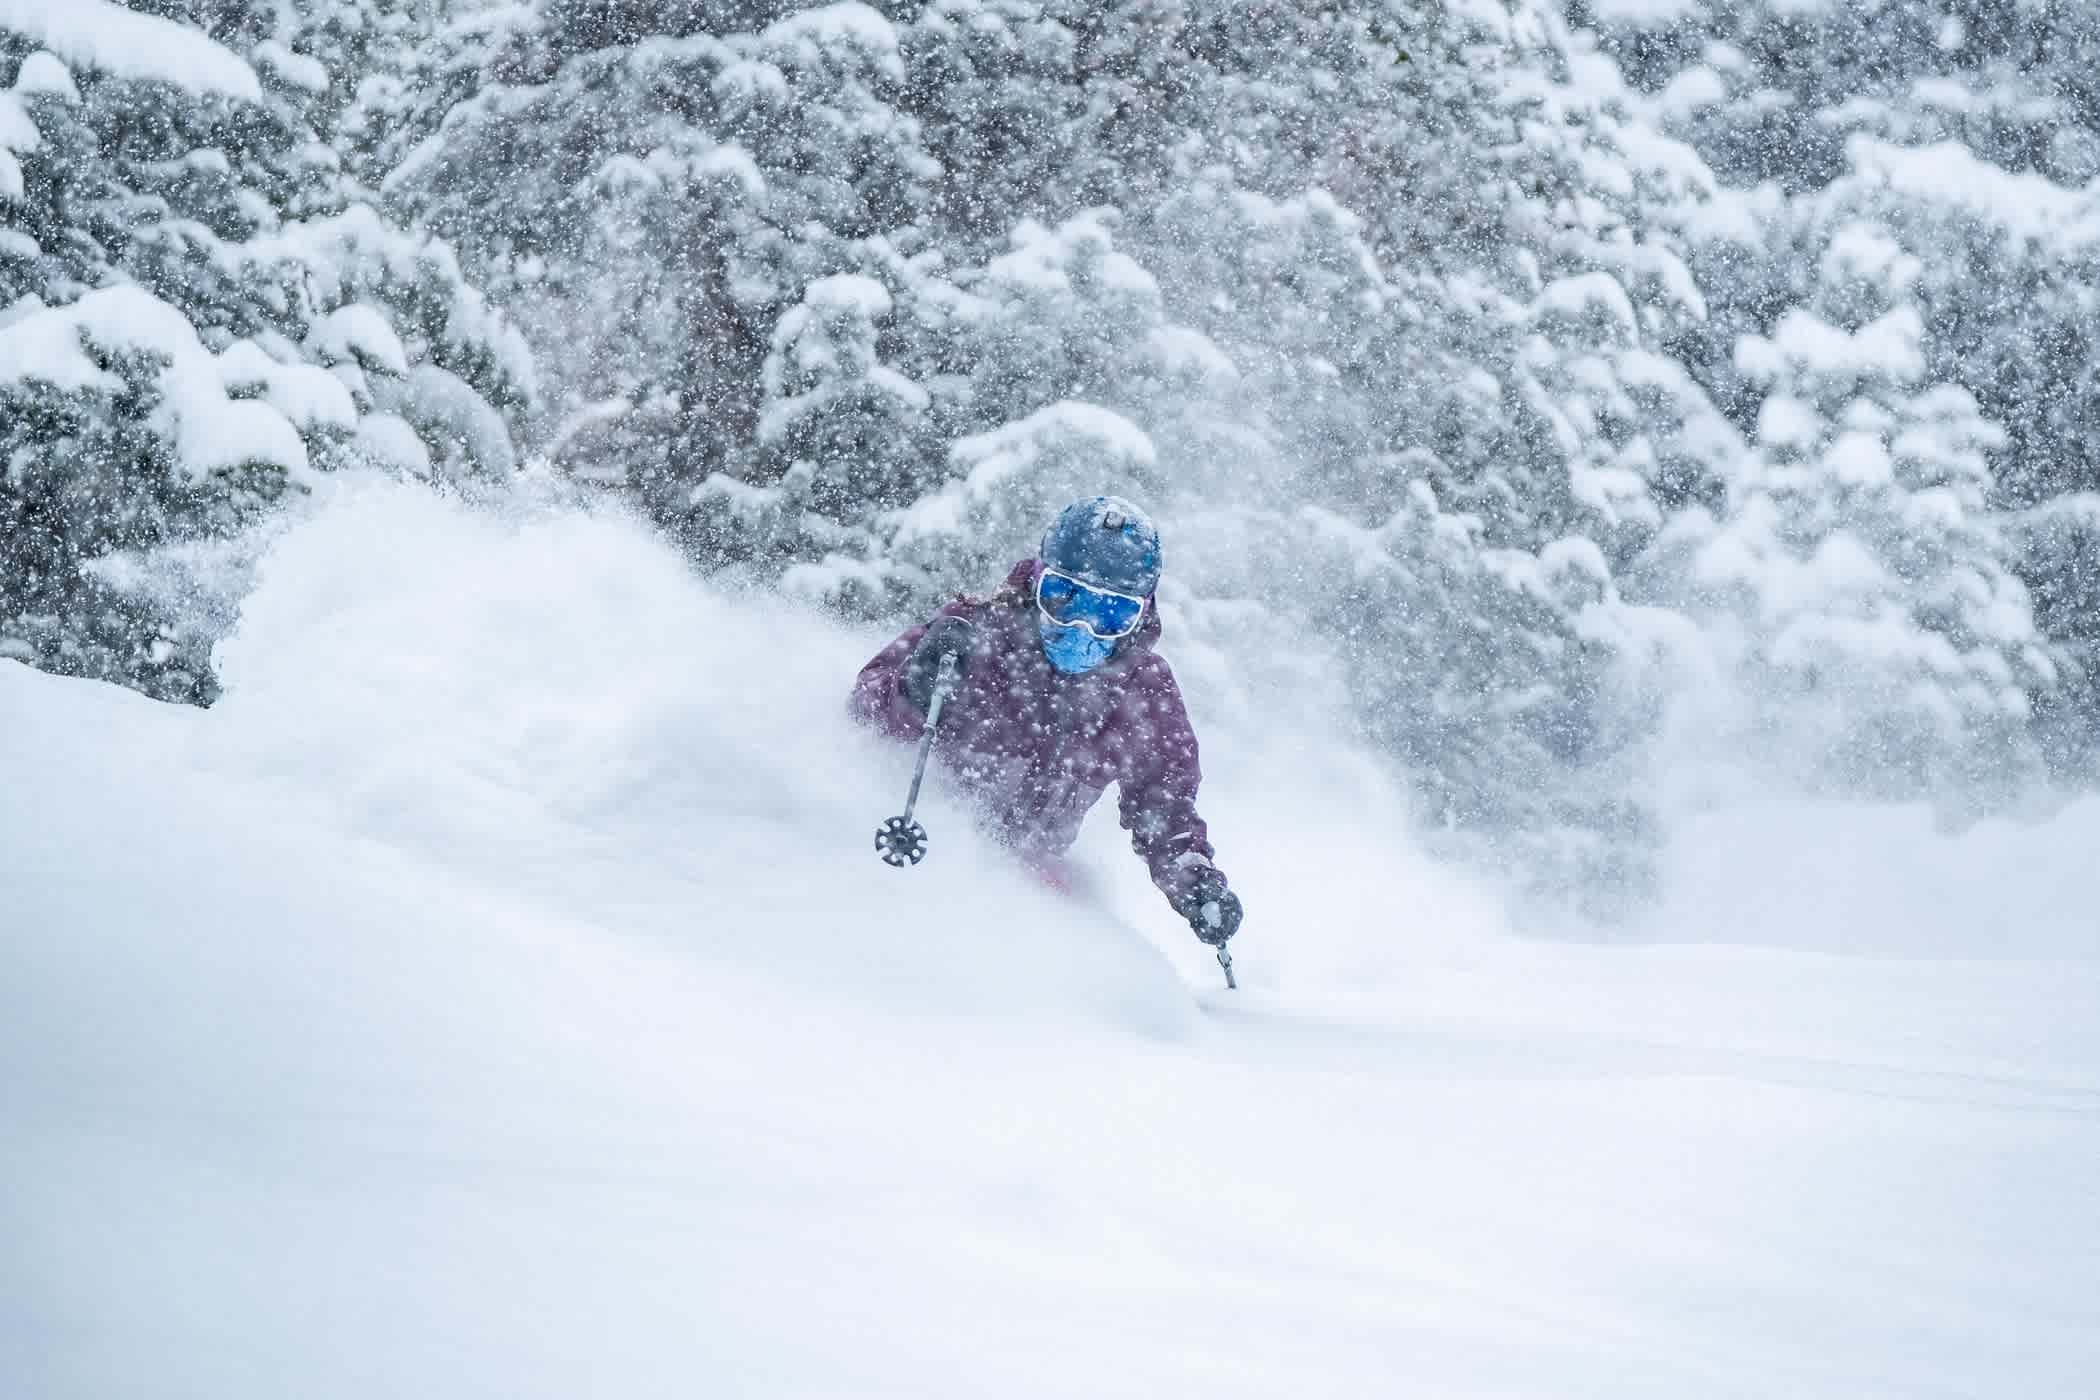 Megan McJames enjoys some storm skiing   Photo: Iz La Motte